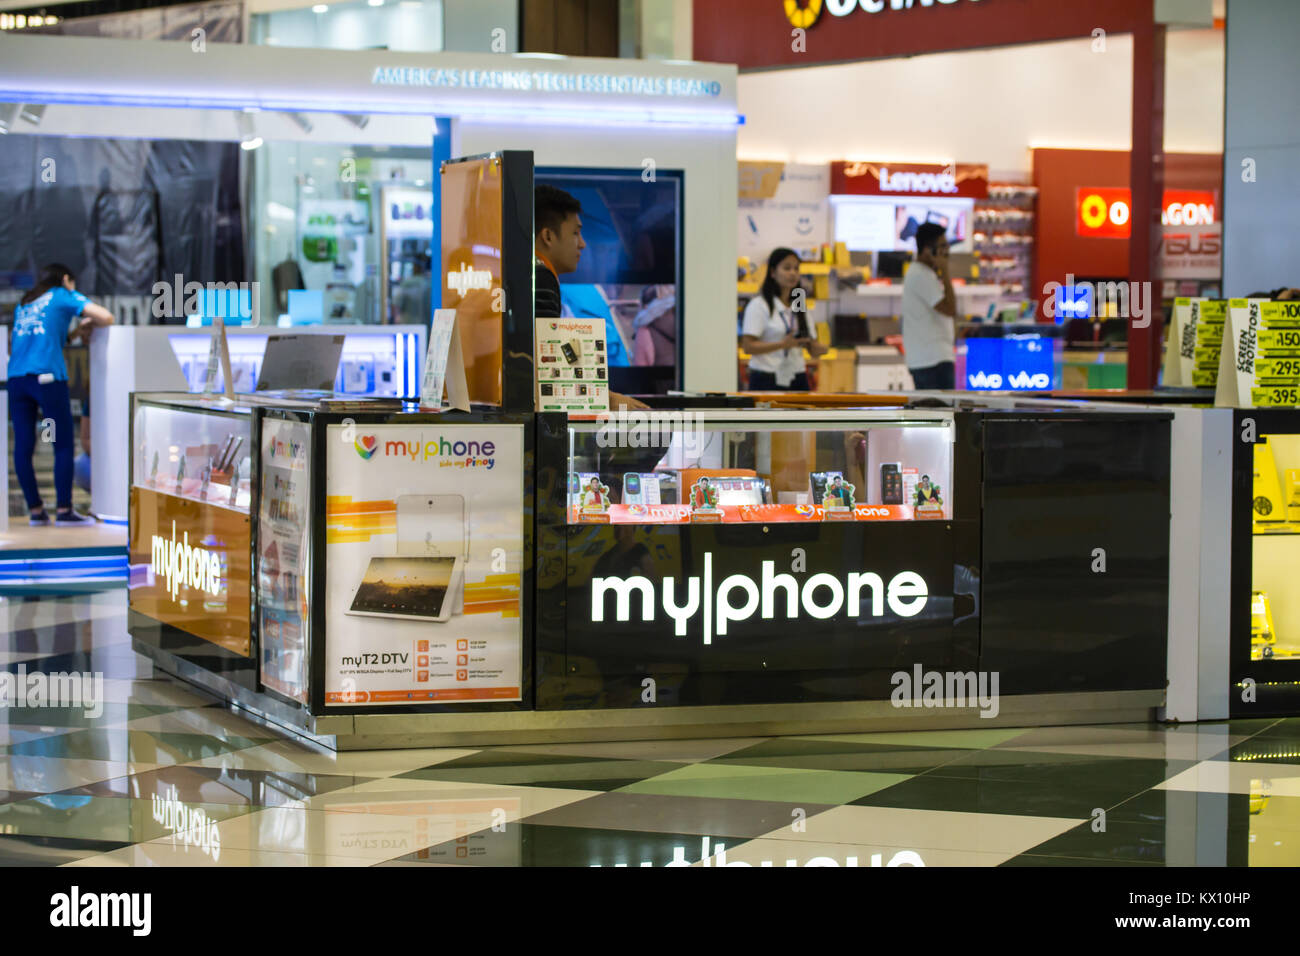 A myphone kiosk within SM Seaside Mall,Cebu City.A Filipono mobile phone company popular amongst Filipinos in general. - Stock Image